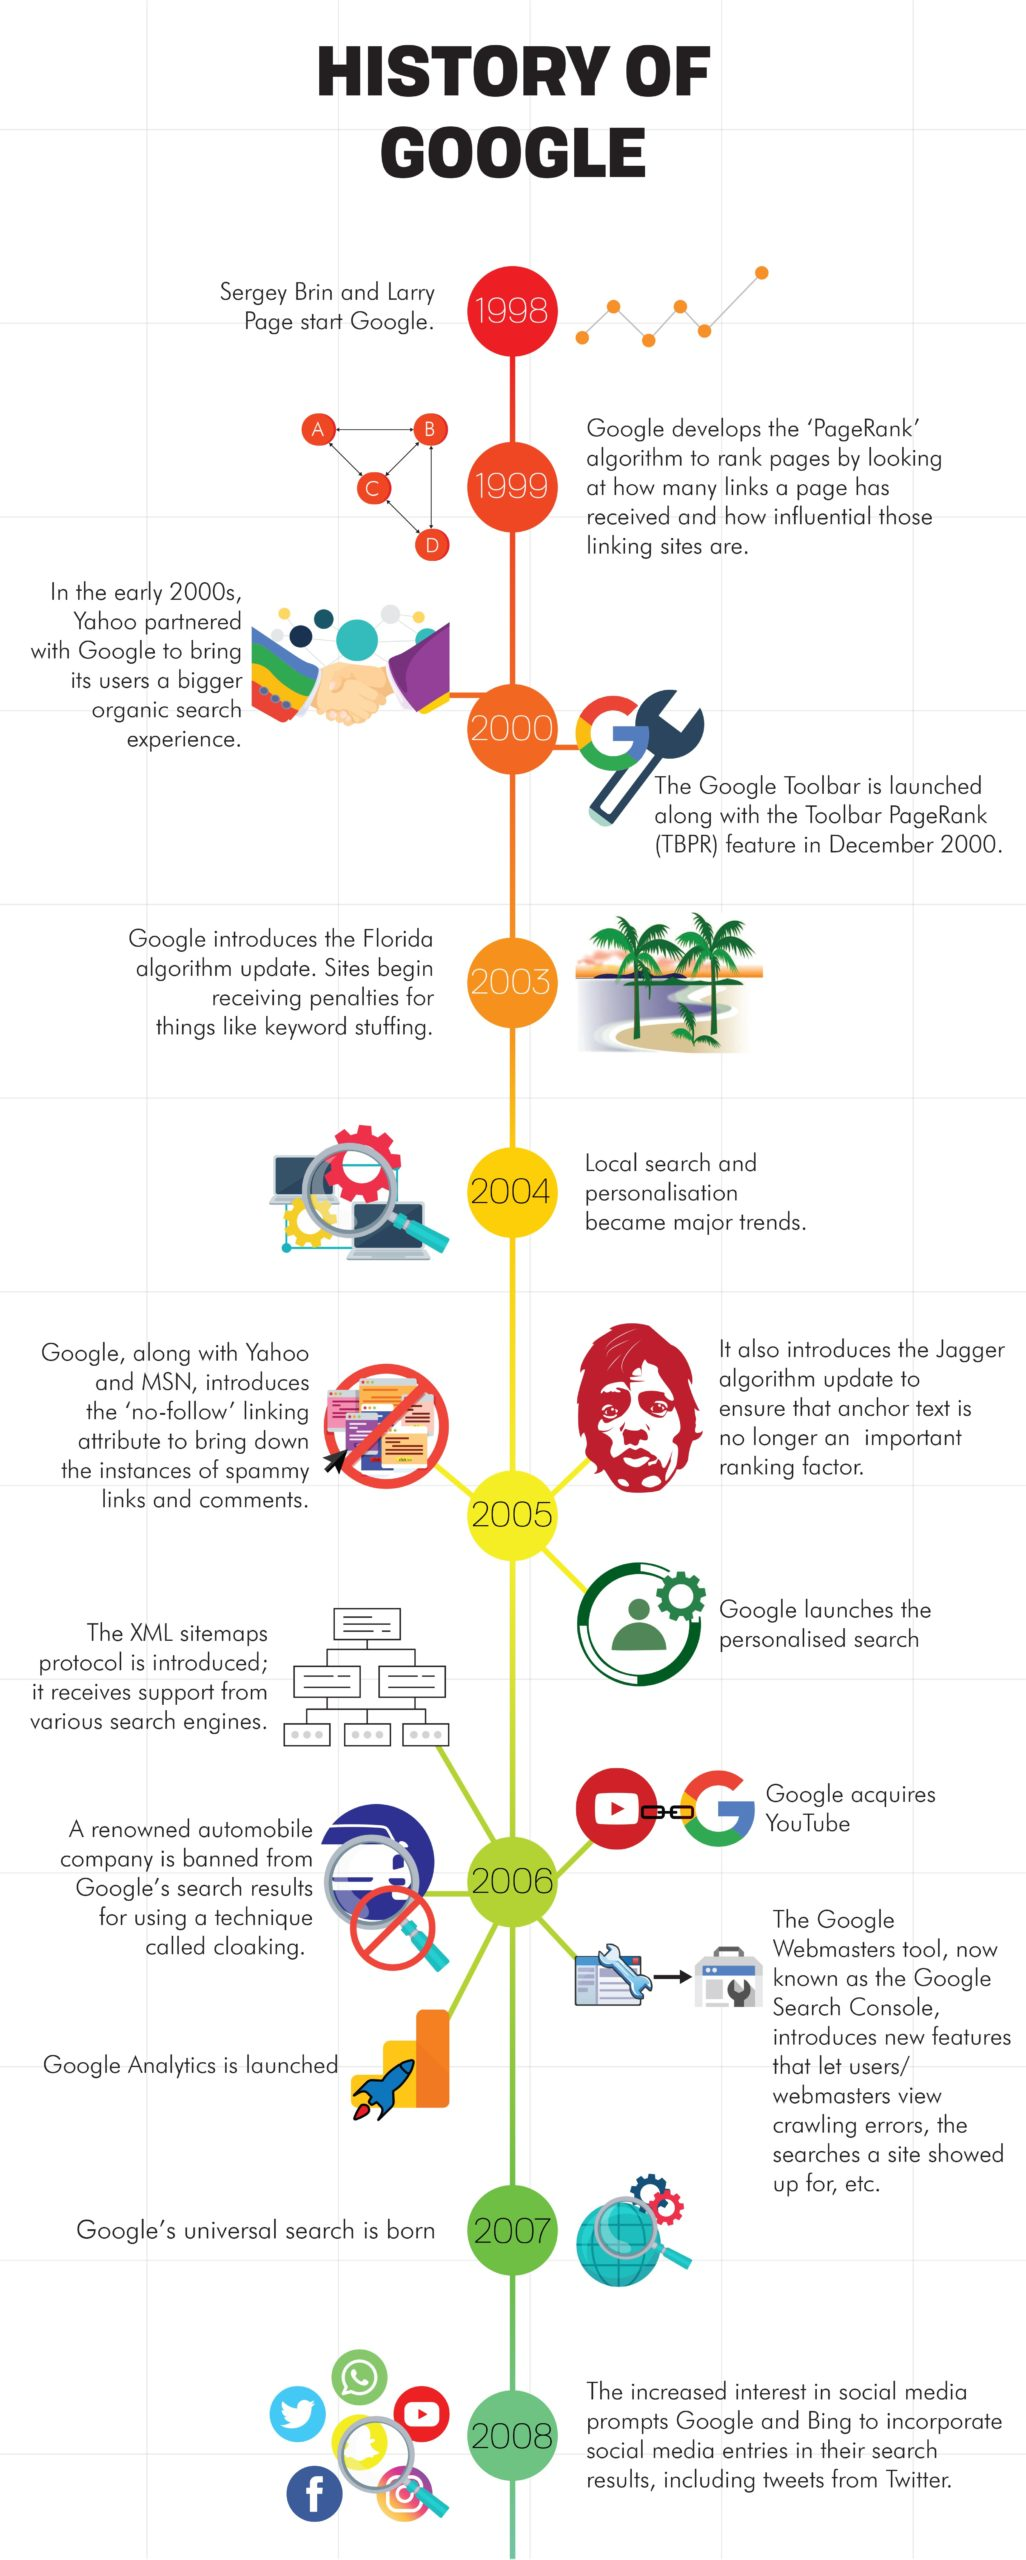 Brief History of Google